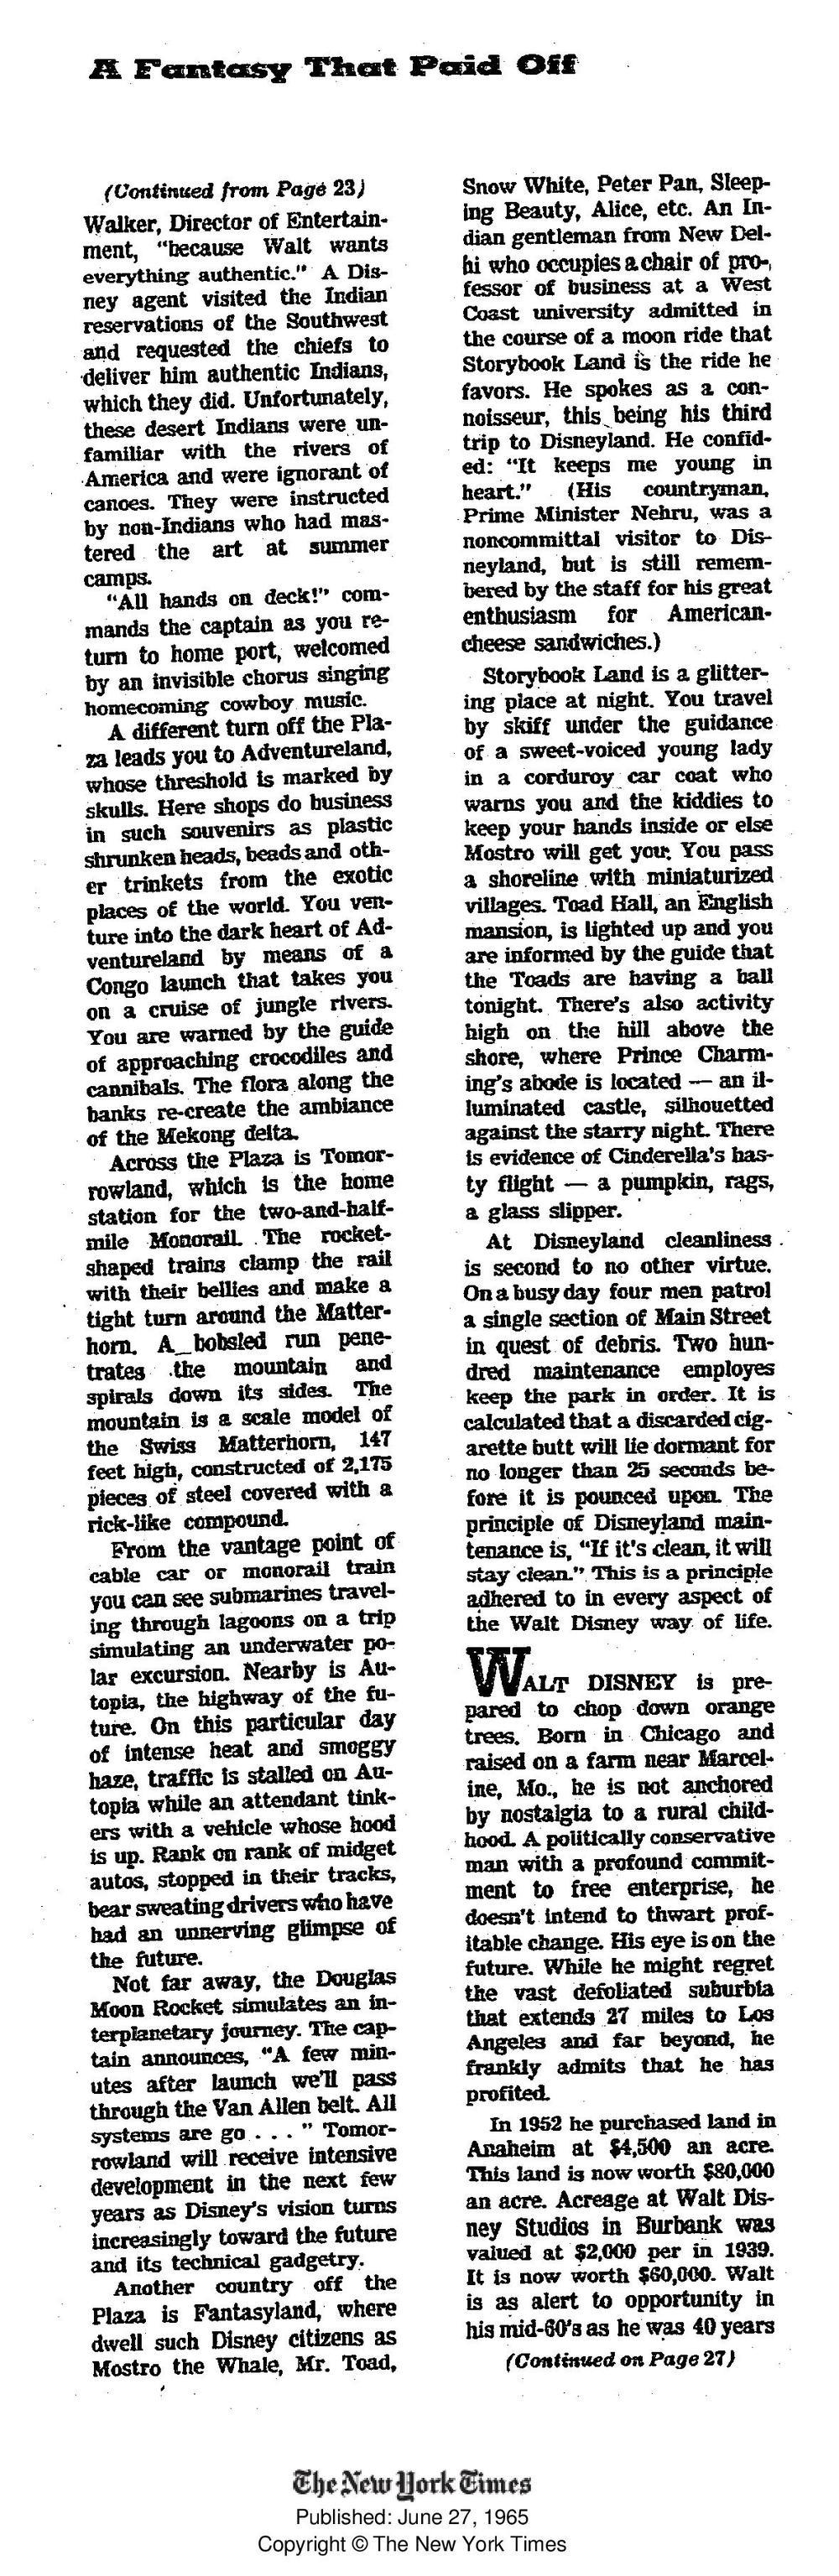 Fantasy1965-page-003.jpg